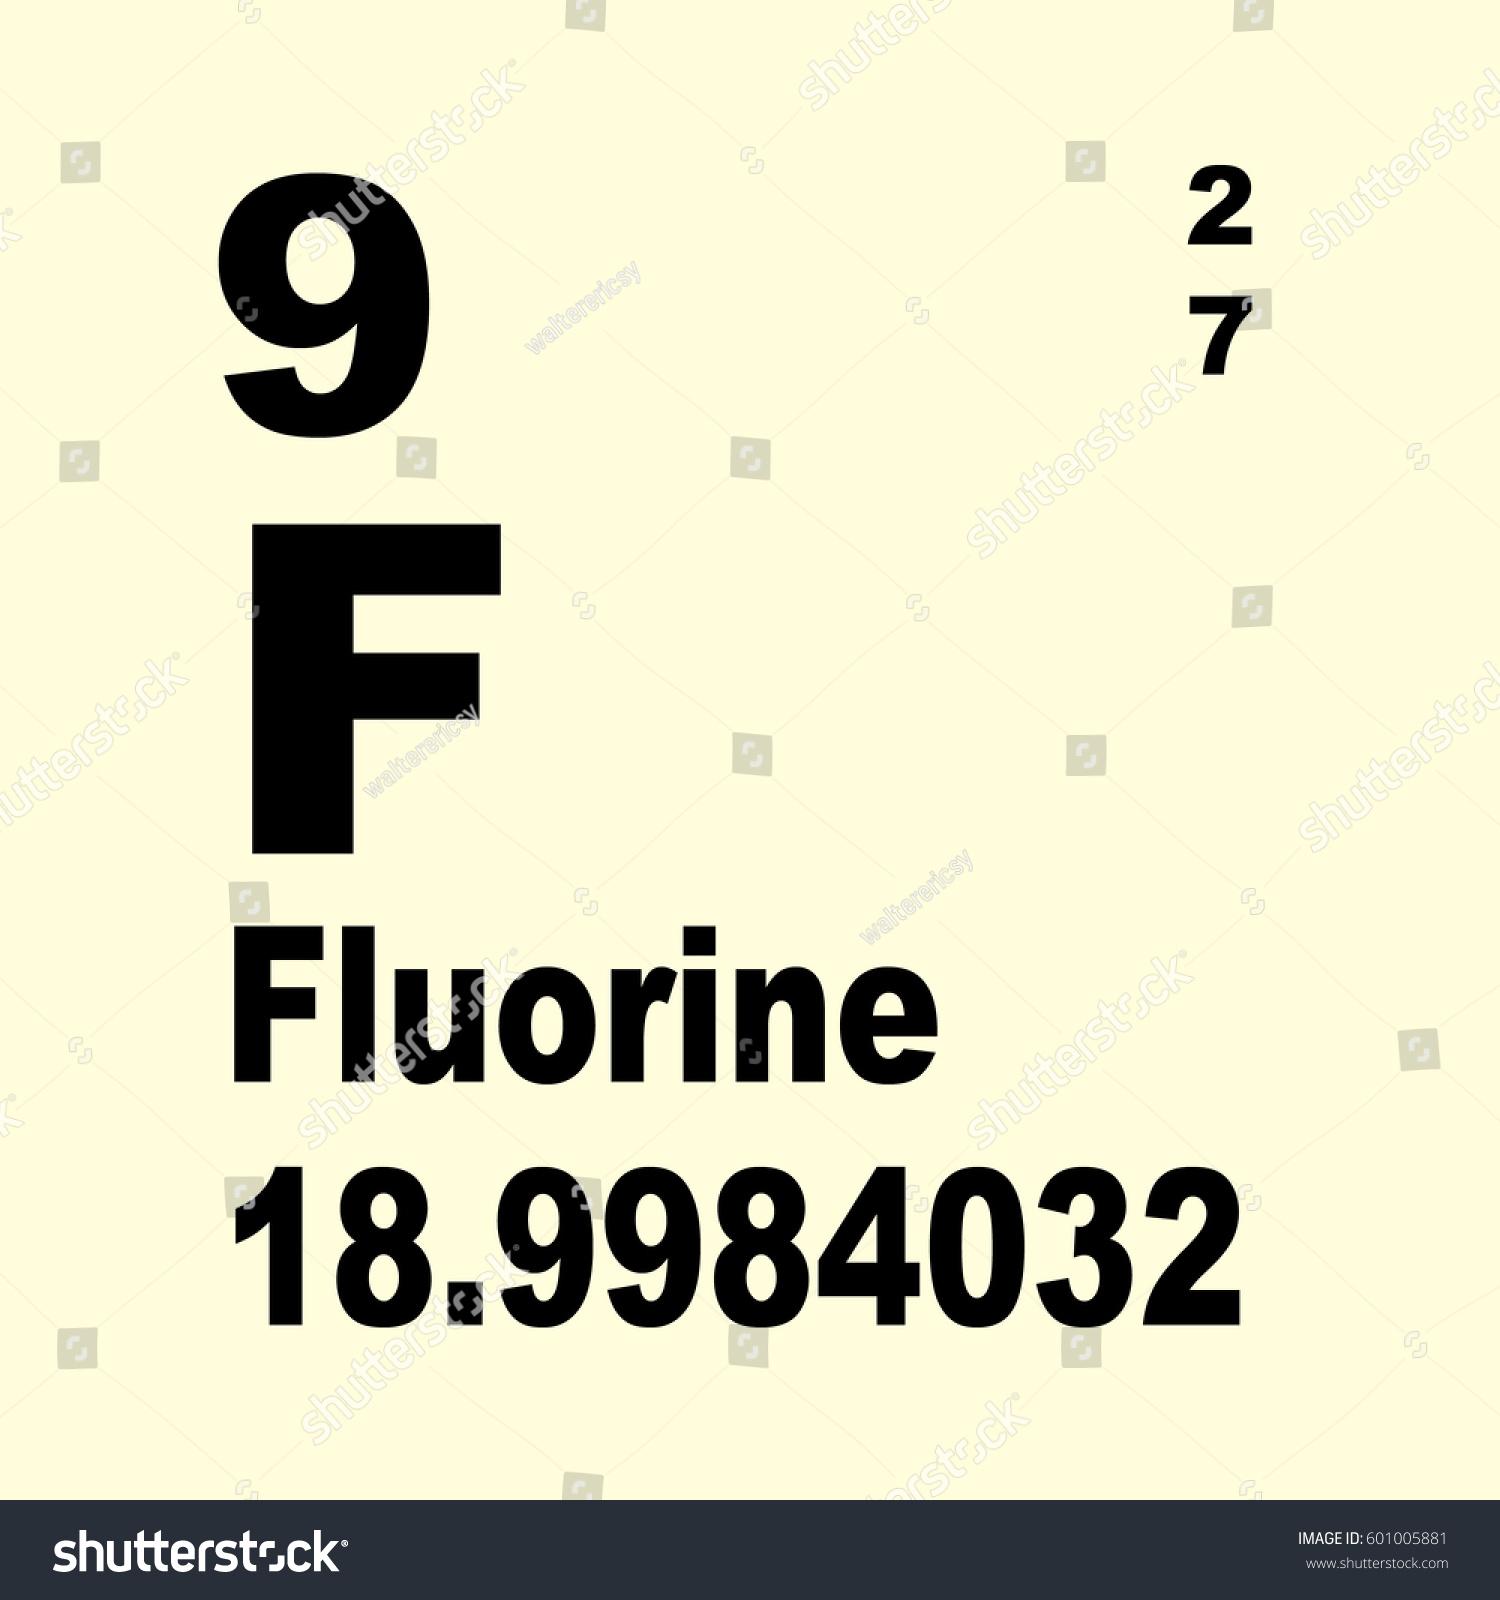 Fluorine periodic table elements stock illustration 601005881 fluorine periodic table of elements gamestrikefo Gallery